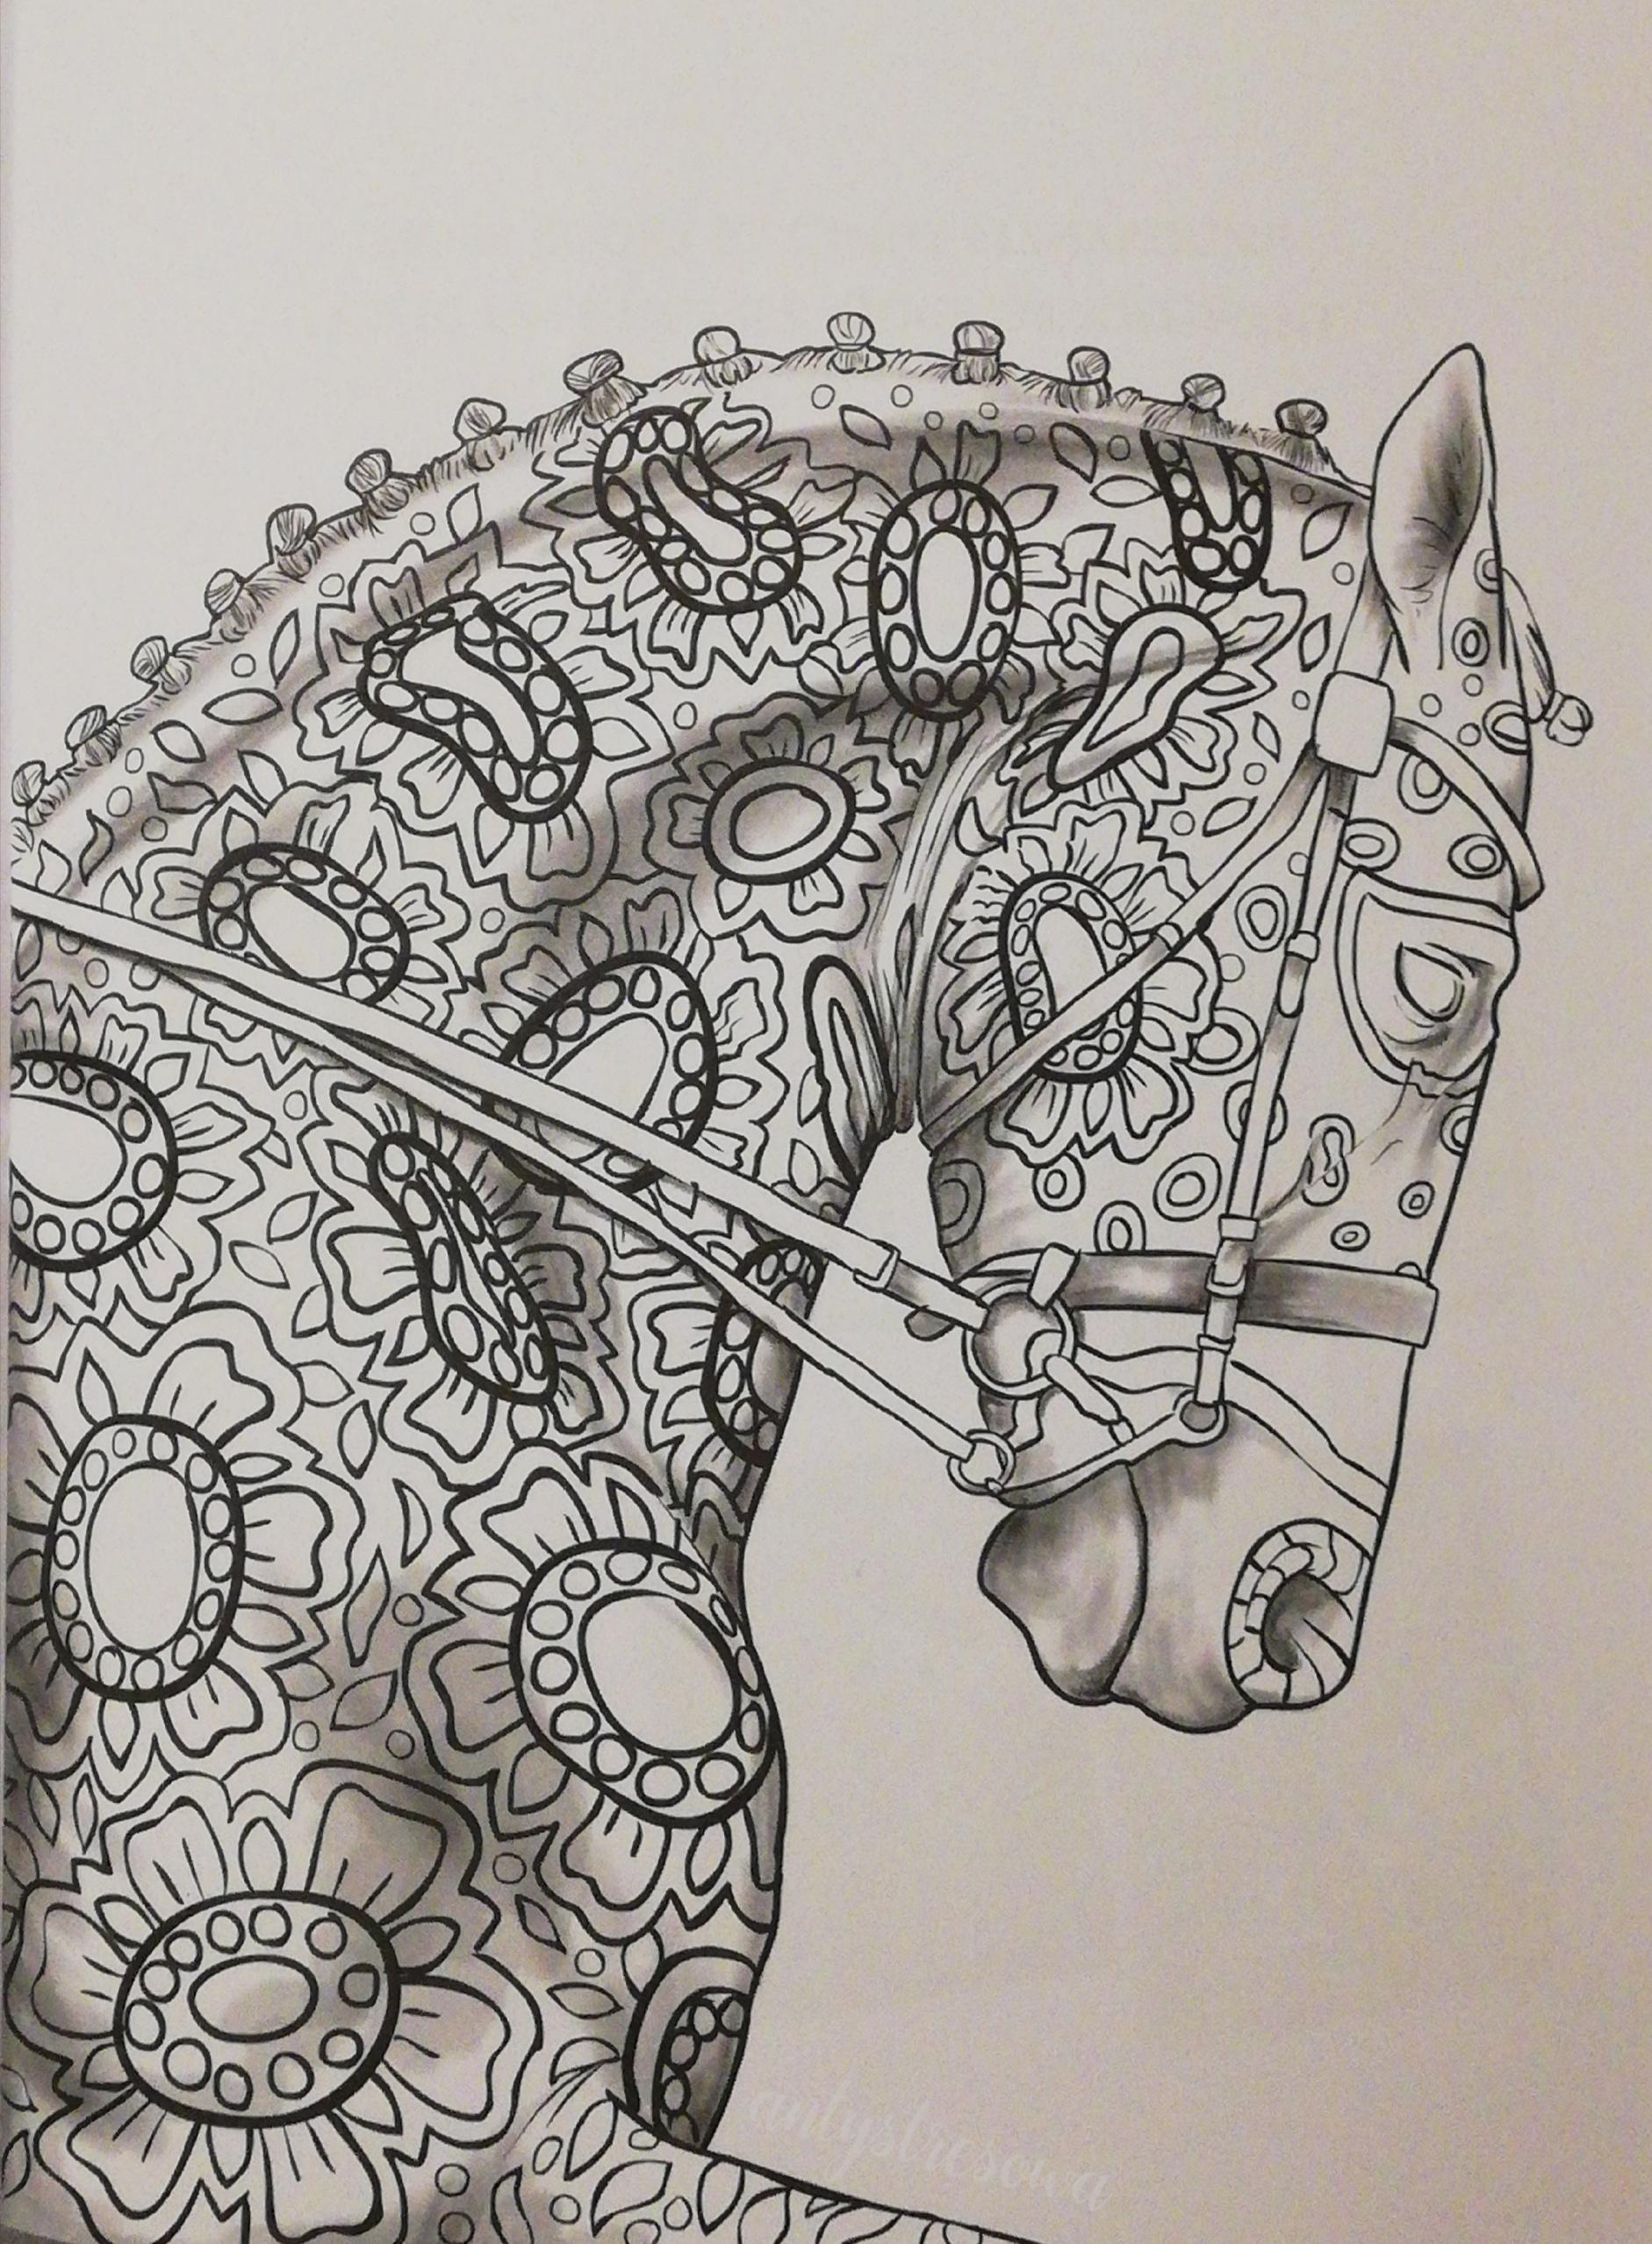 Cindy Elsharouni, The amazing world of horses grayscale